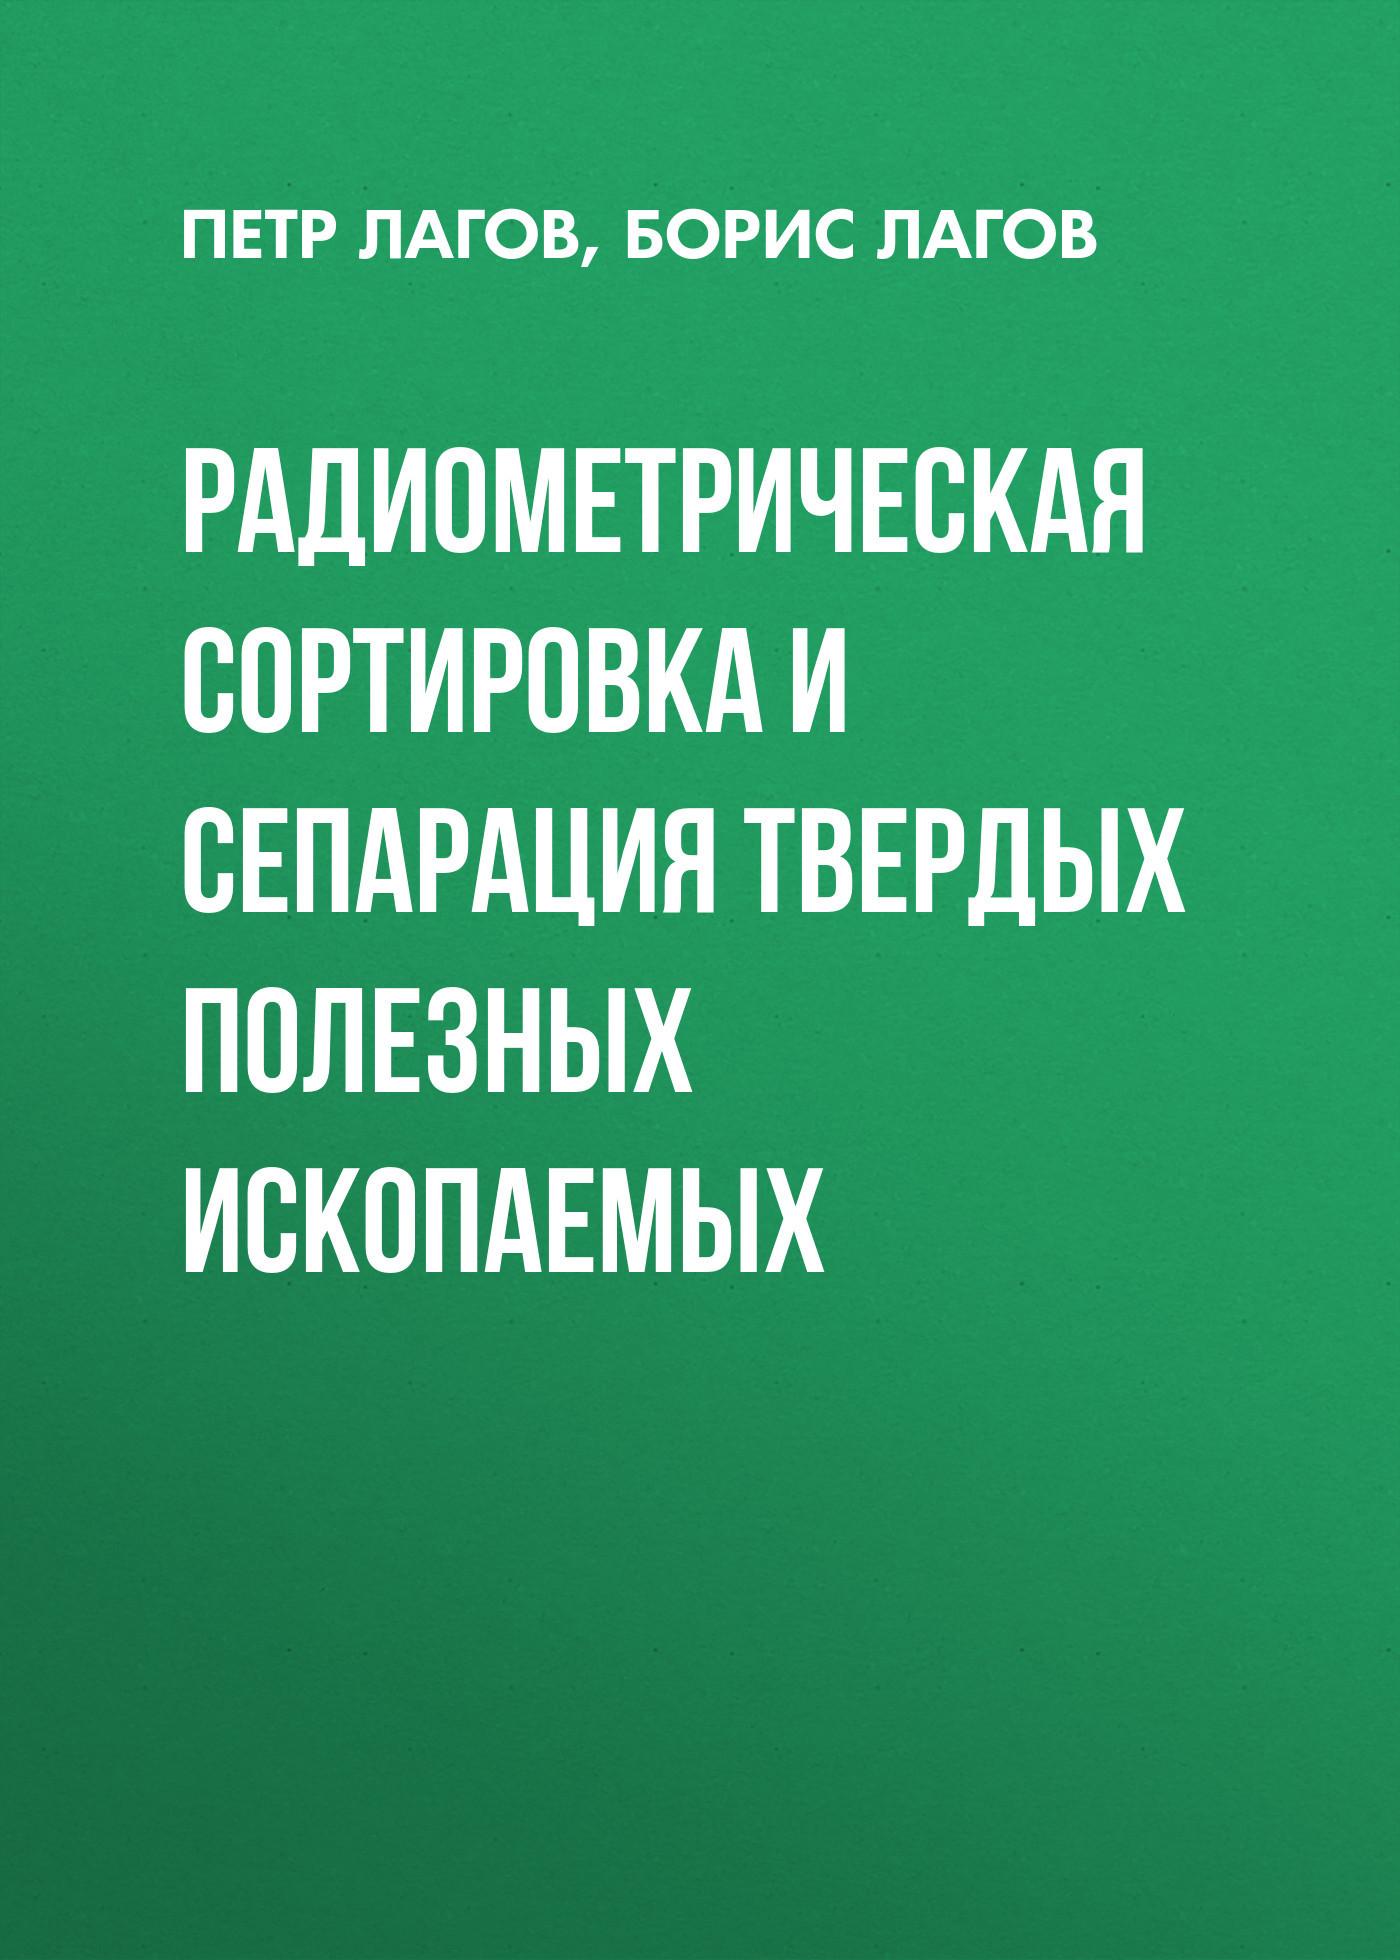 Петр Лагов бесплатно